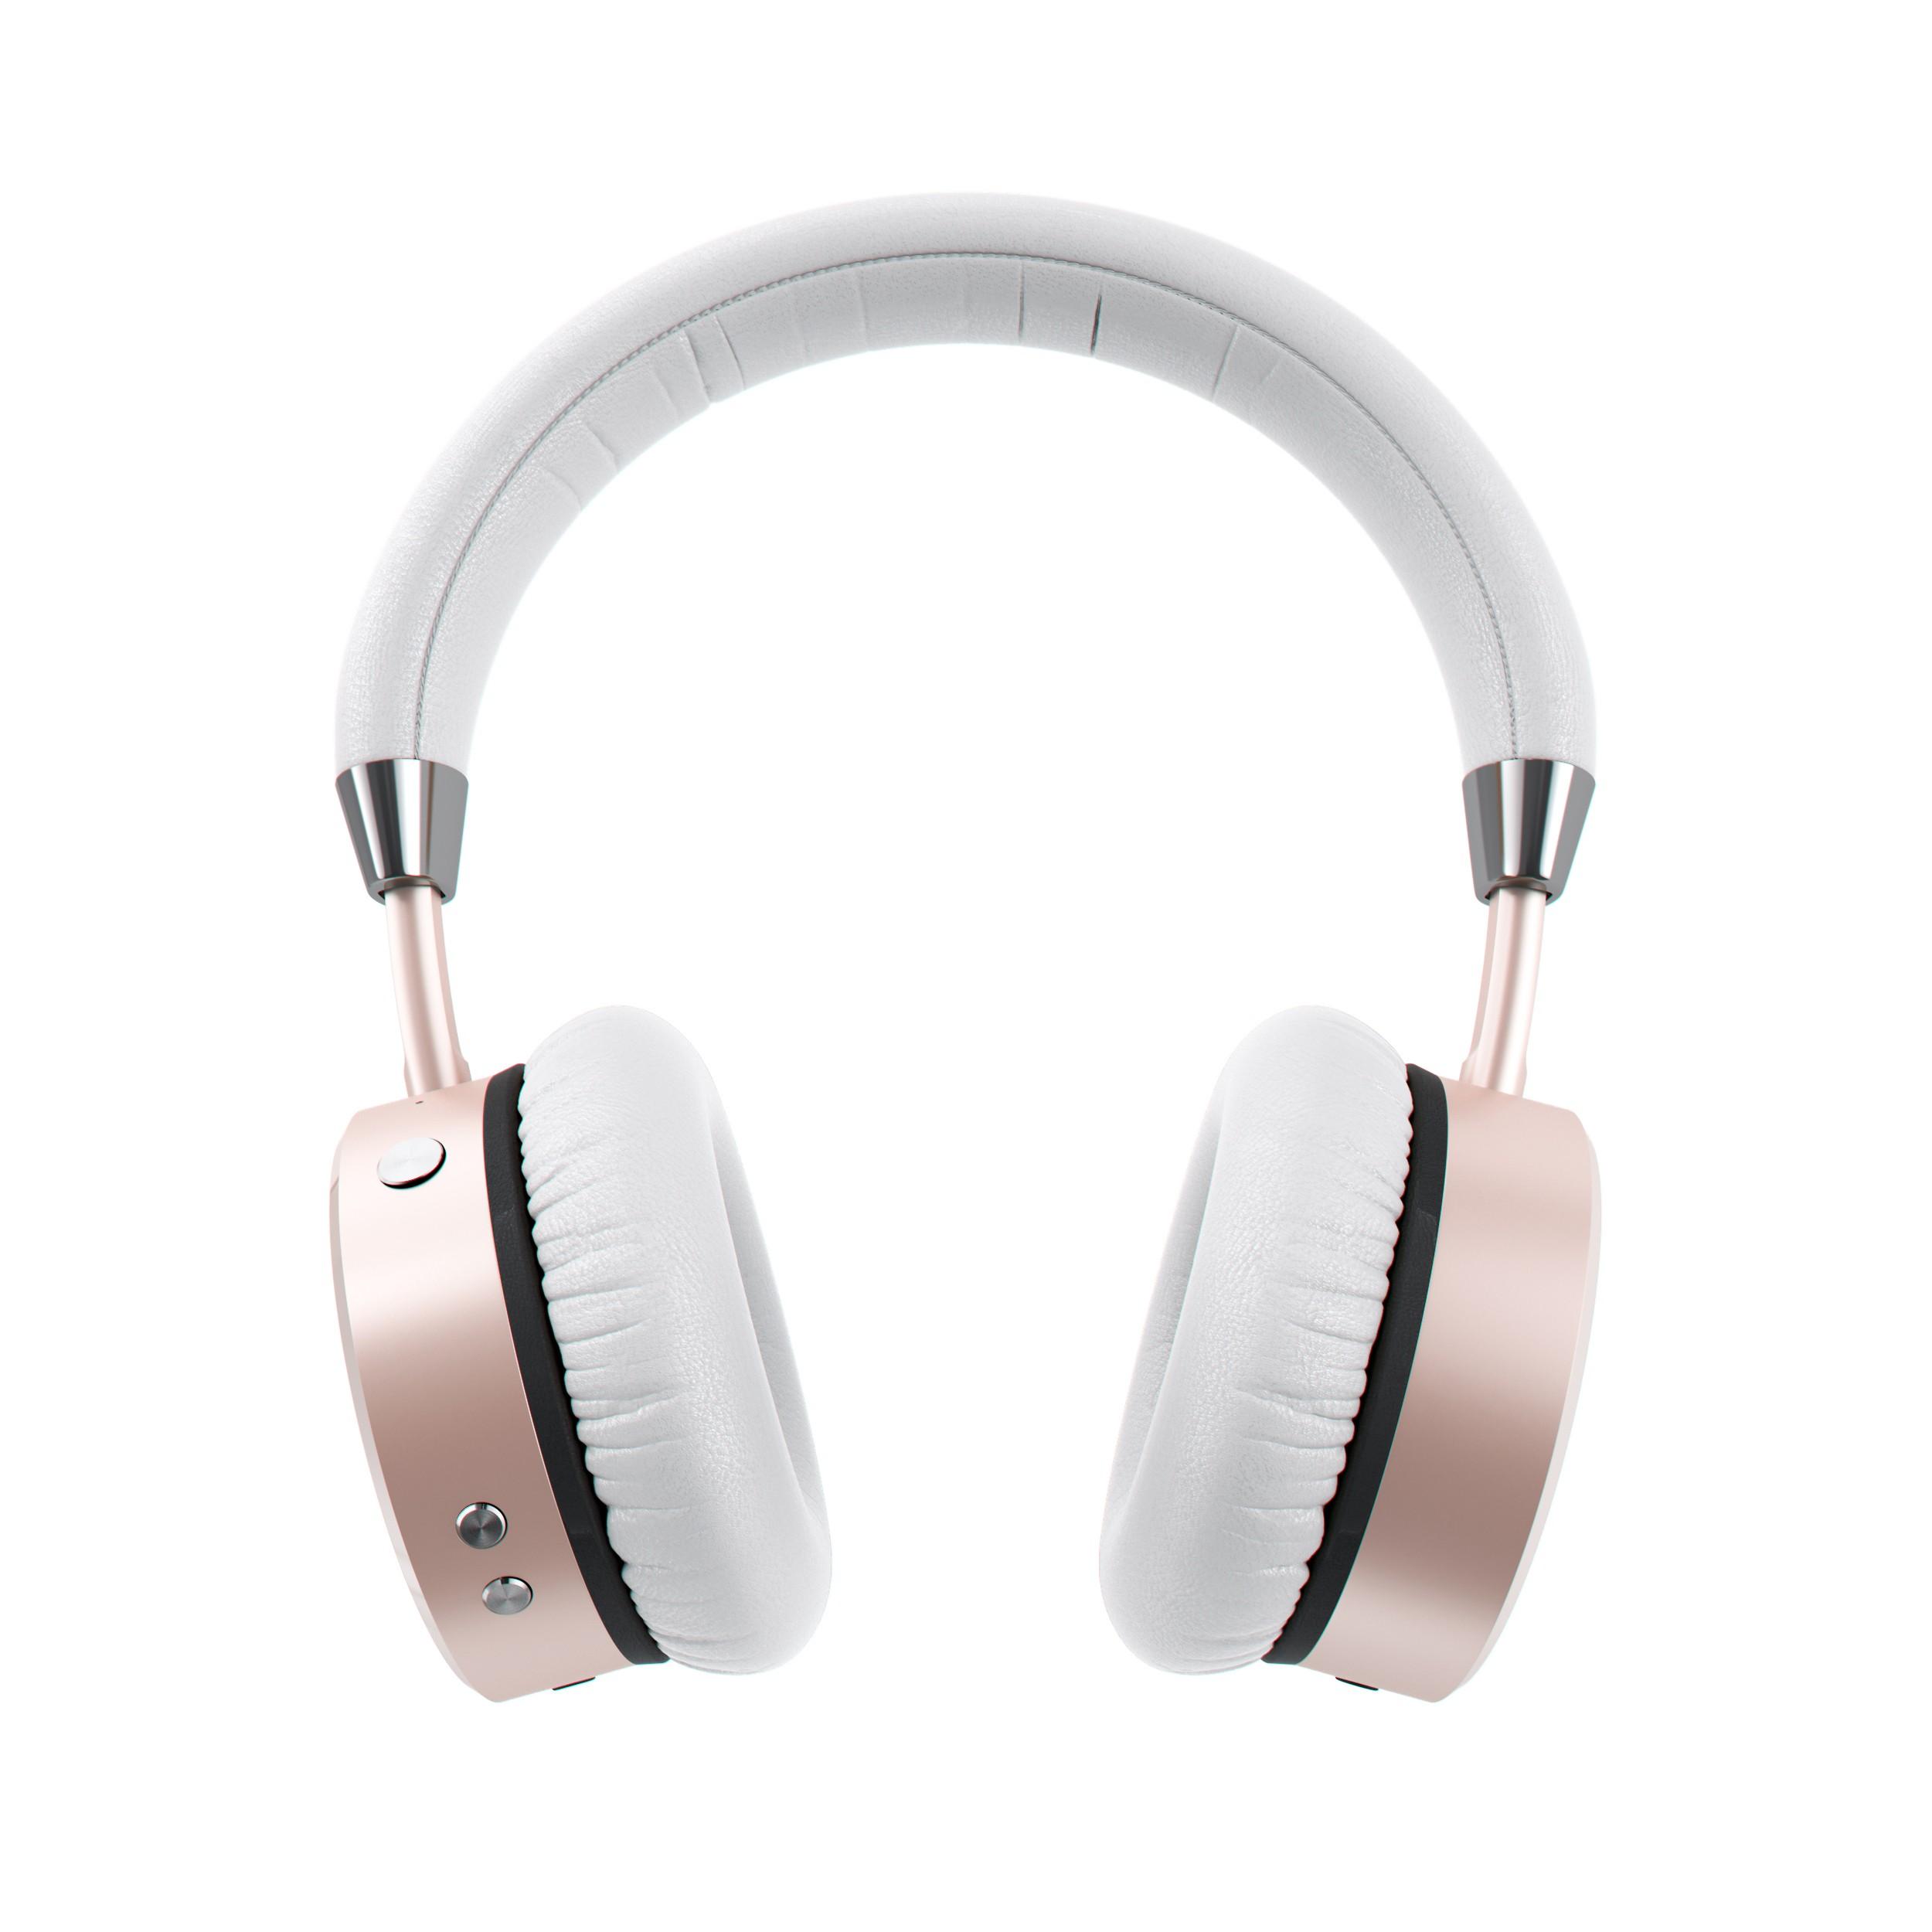 Satechi Aluminum Wireless Headphones (Rose Gold)